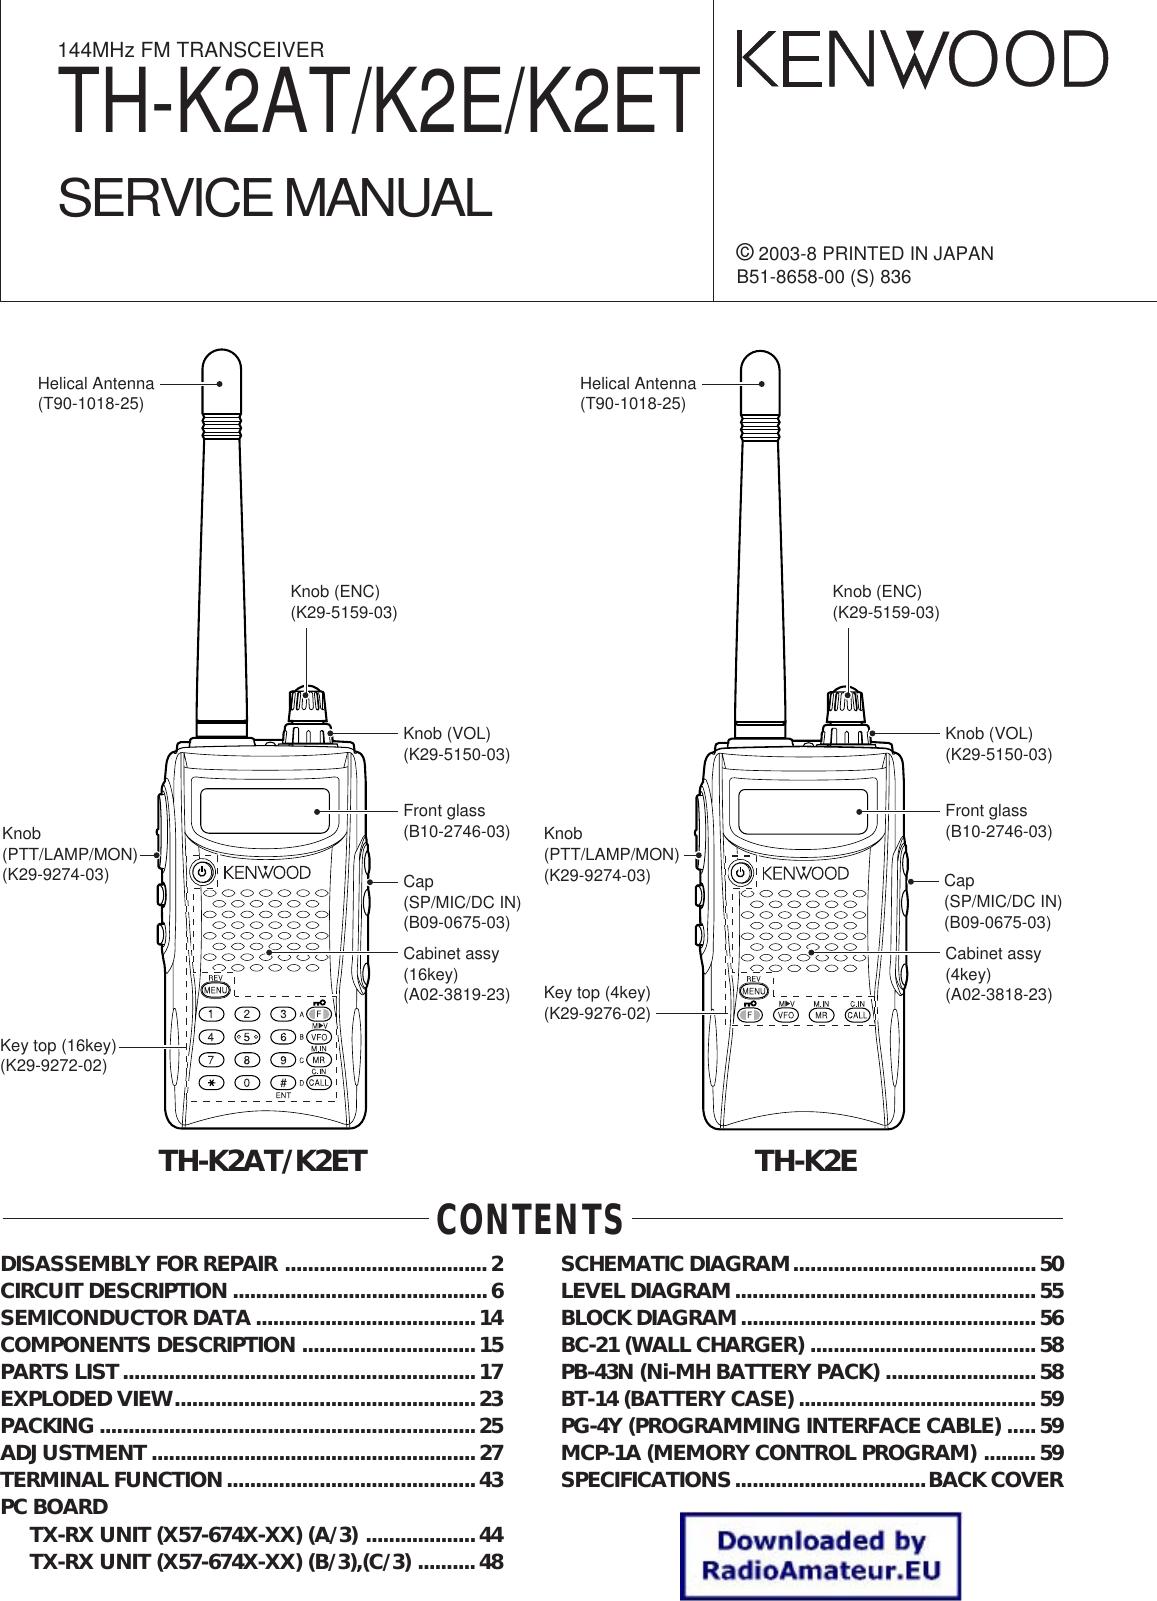 Kenwood 144mhz Fm Transceiver K2e Users Manual Th K2at K2et Service Dtmf Code Radio Transmission Circuit Diagram